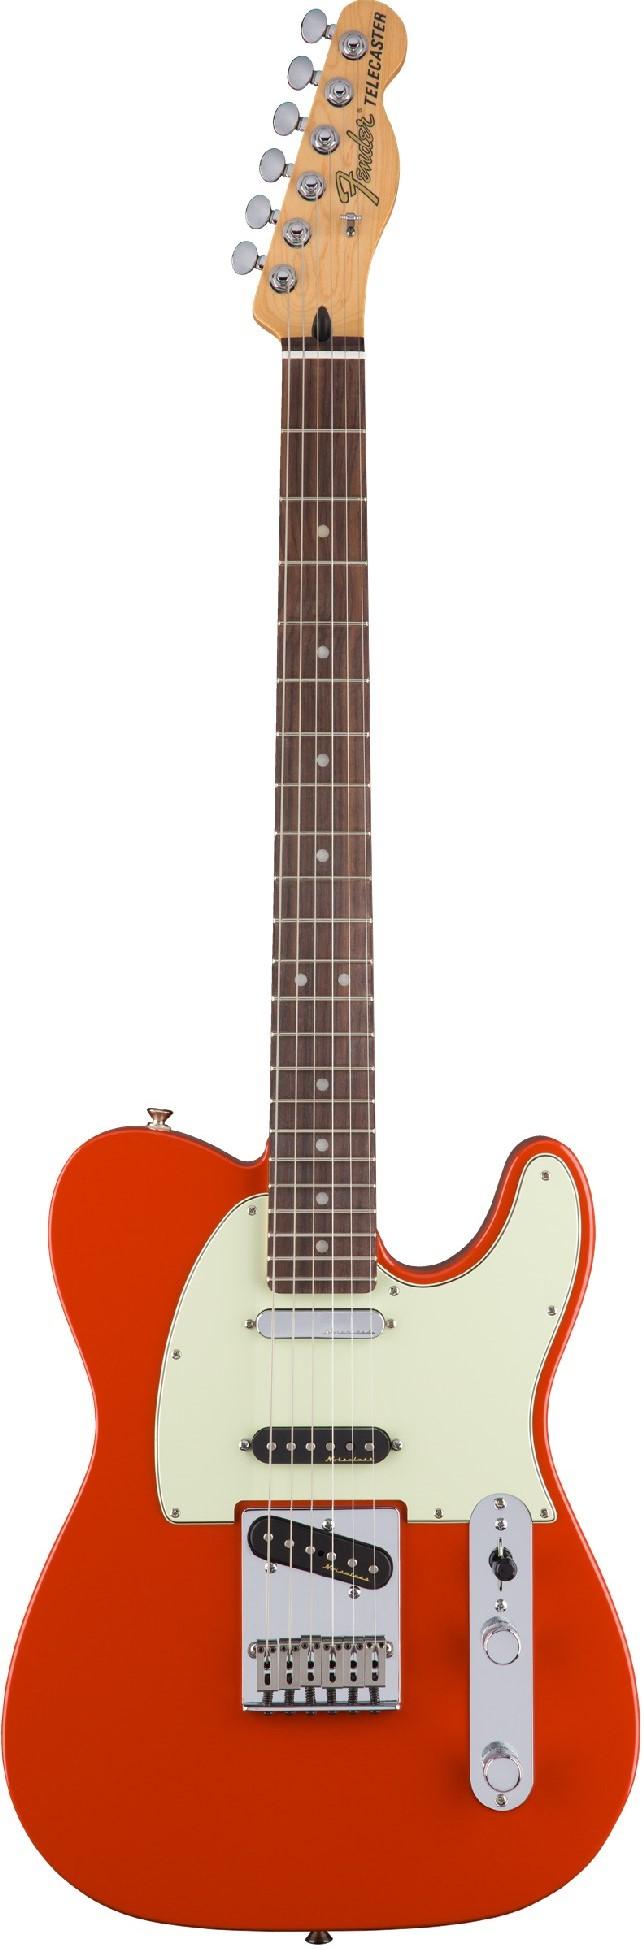 Электрогитара Fender DLX Nashville Tele PF FRD